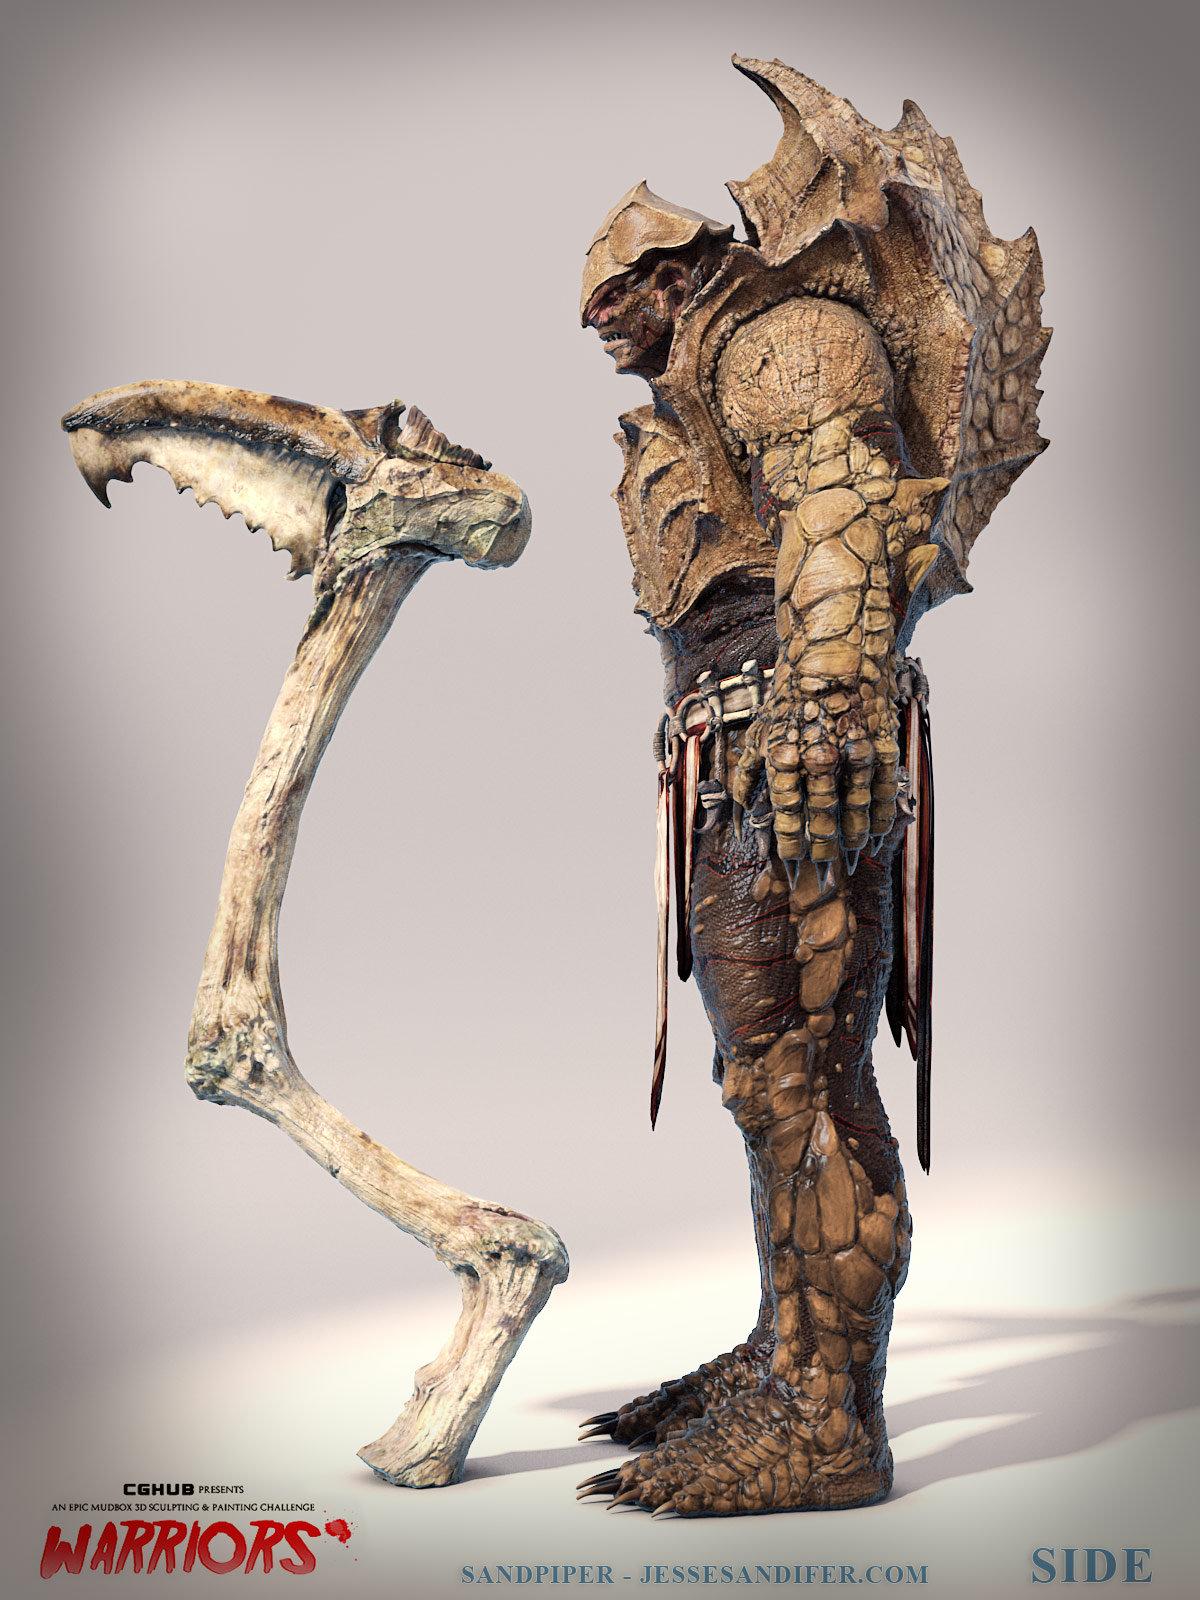 Warrior ortho siderender web